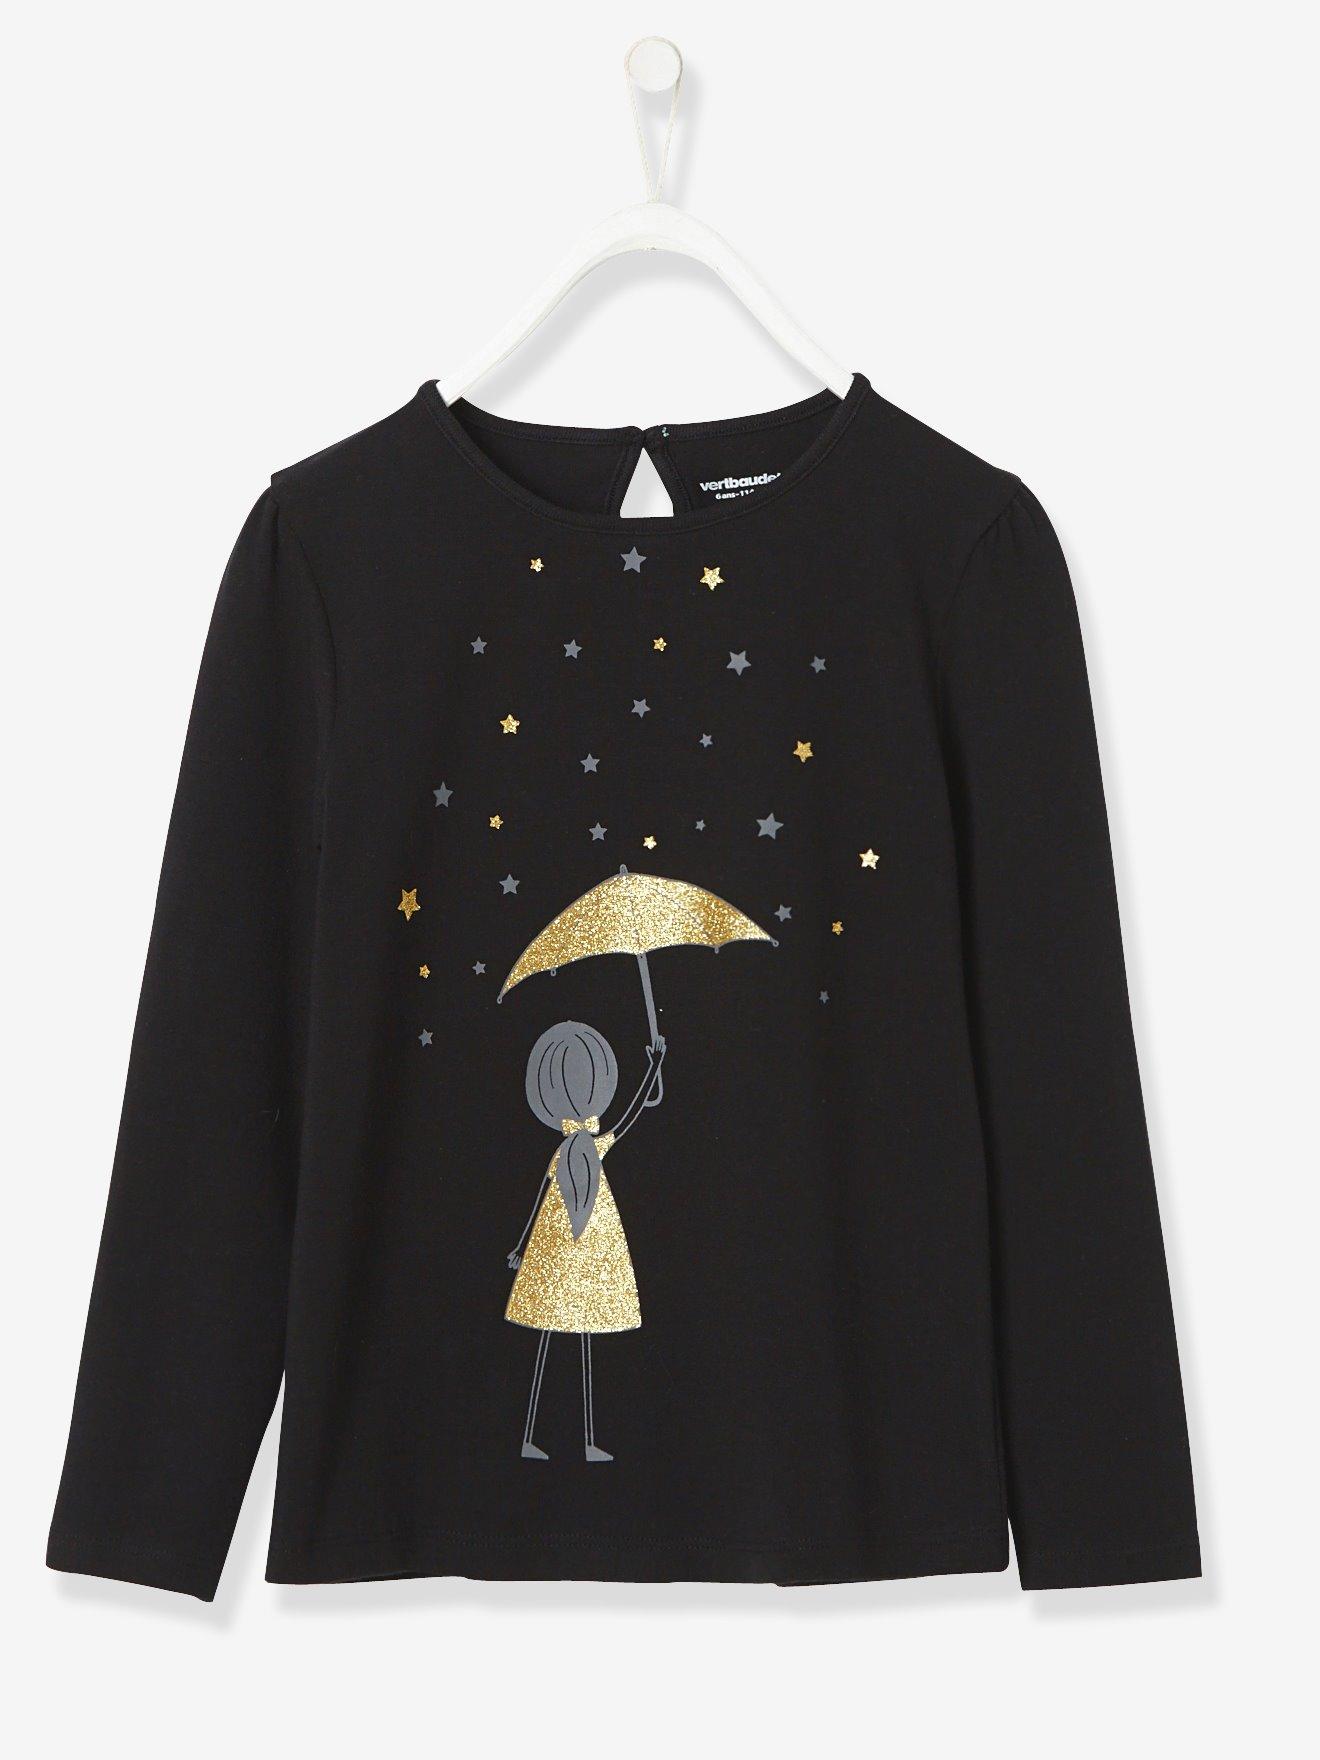 Girls' Long-Sleeved T-shirt with Stylish Print | Pre-Christmas Shopping